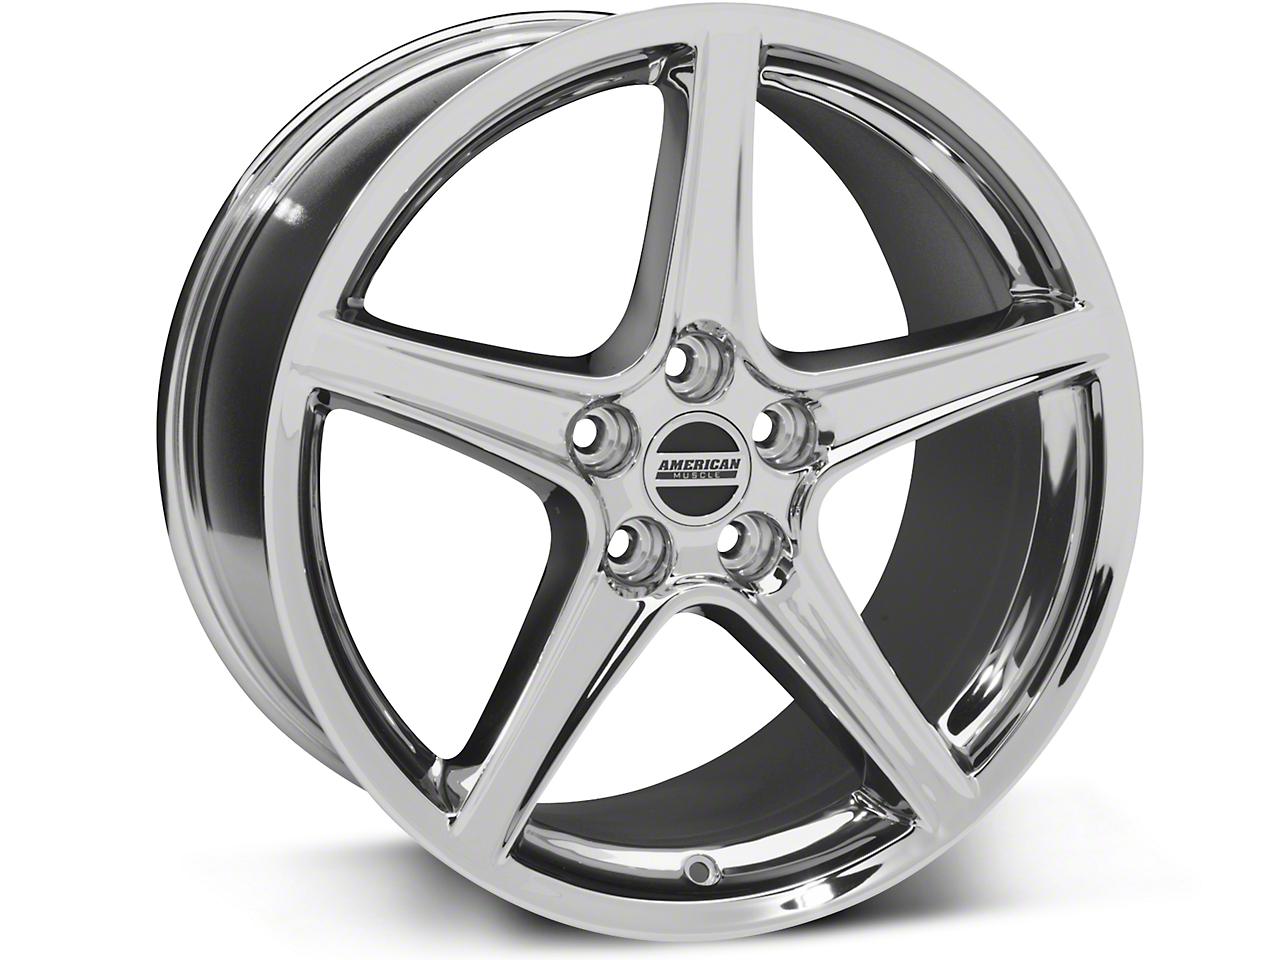 Saleen Style Chrome Wheel - 19x10 (15-16 V6, EcoBoost)